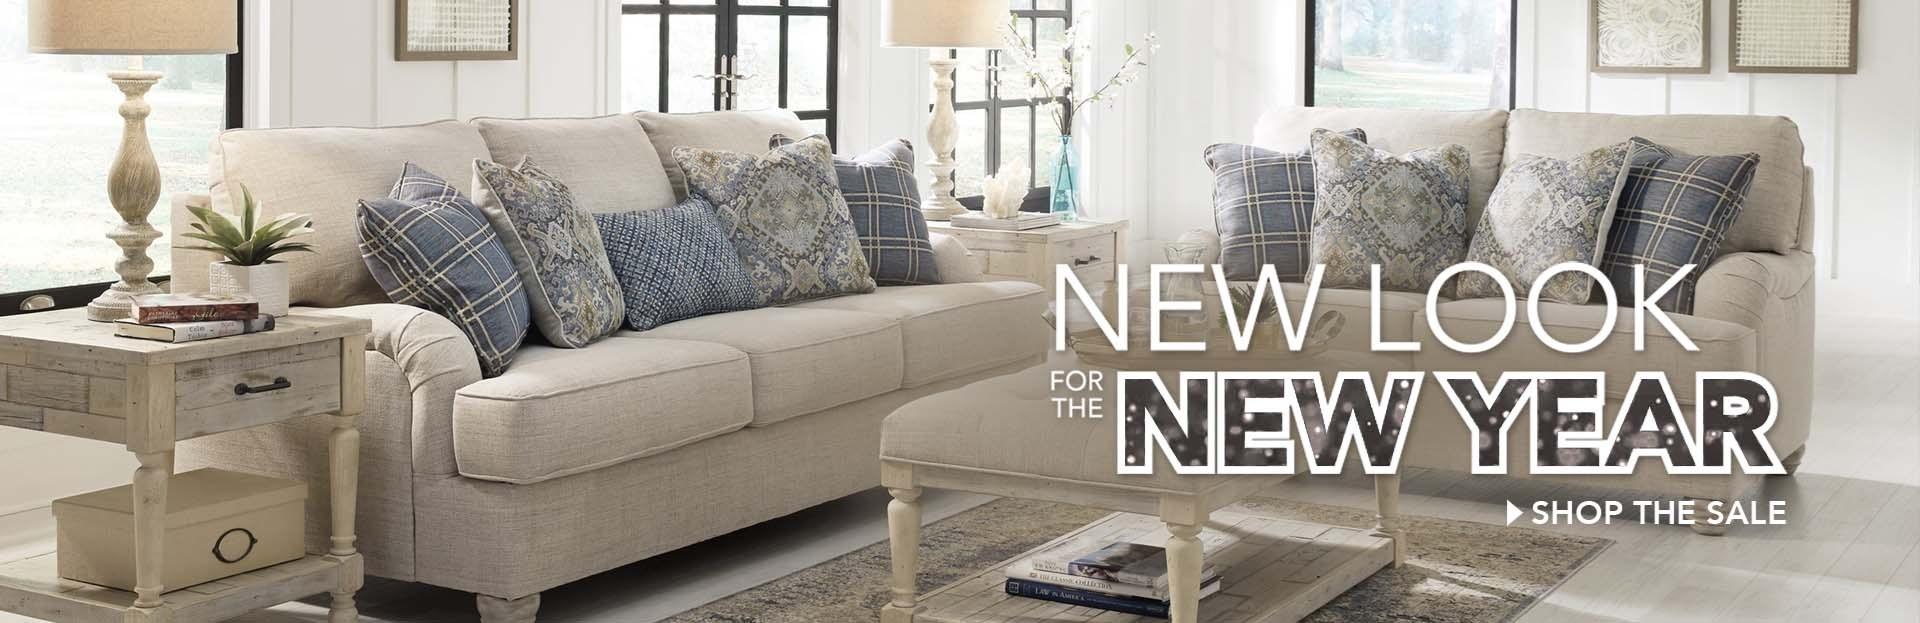 Furniture Sale At Royal Furniture Get The Best Deals At Royal